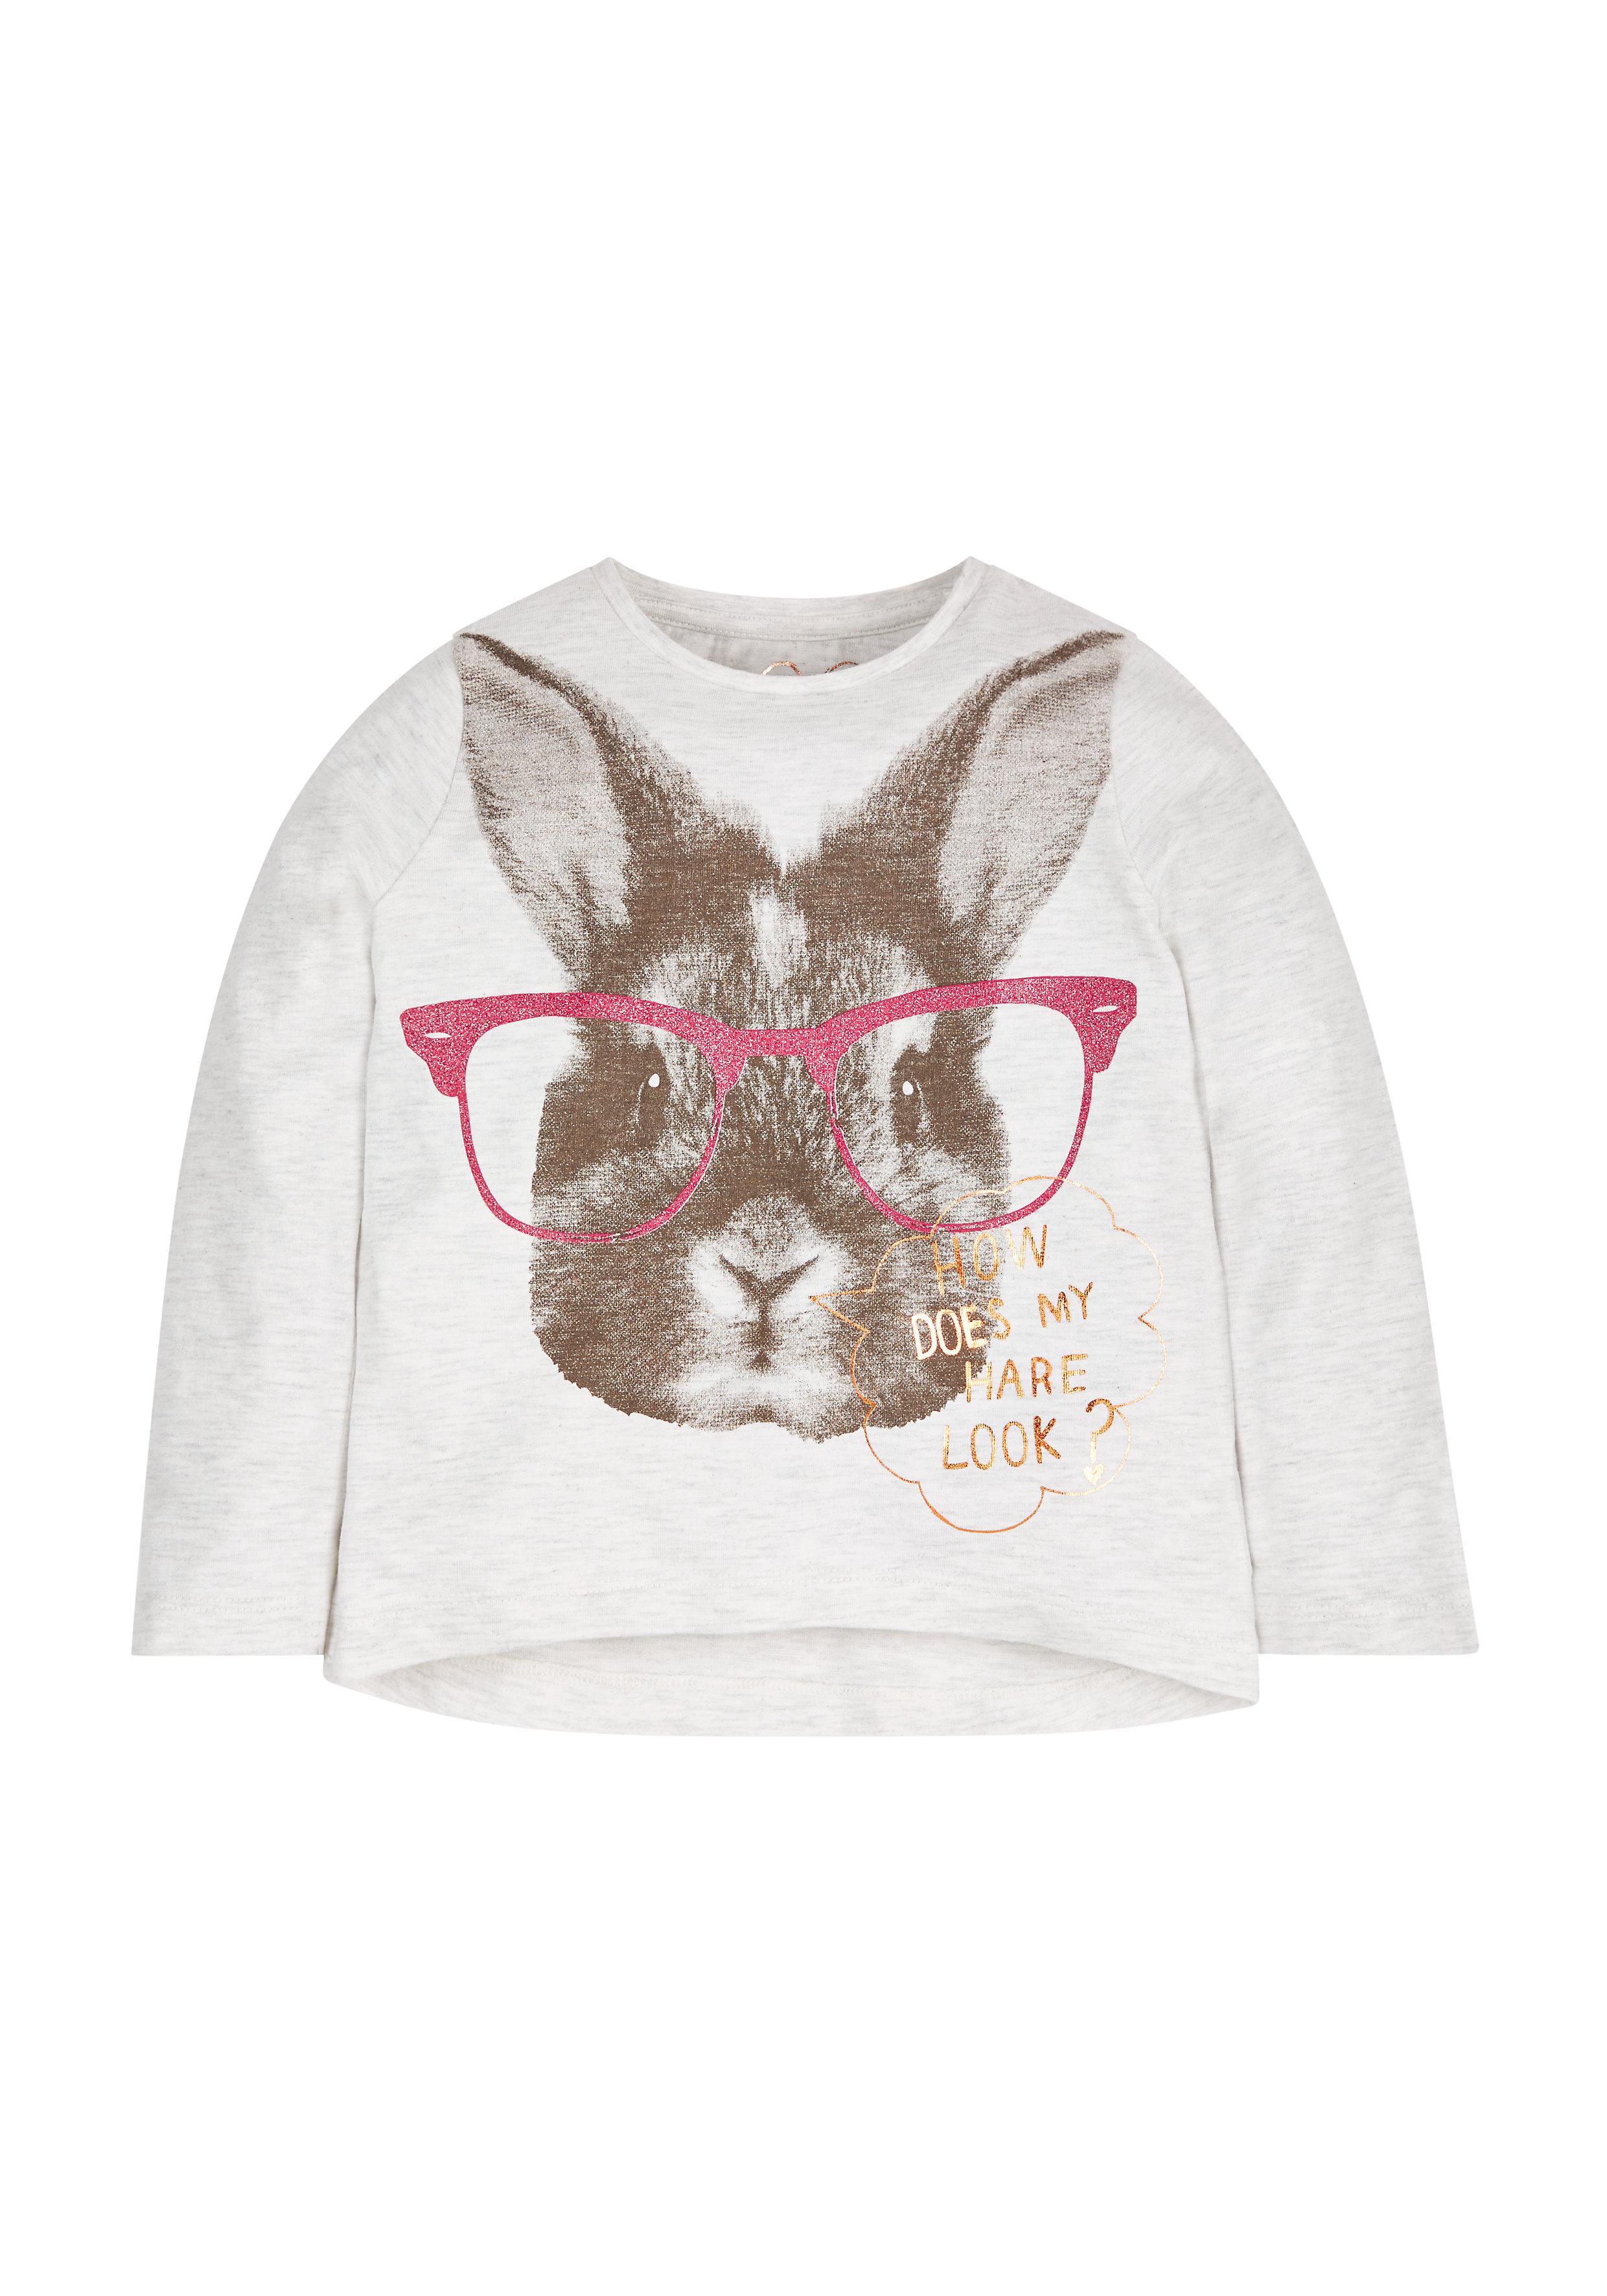 Mothercare   Girls Bunny T-Shirt  - White